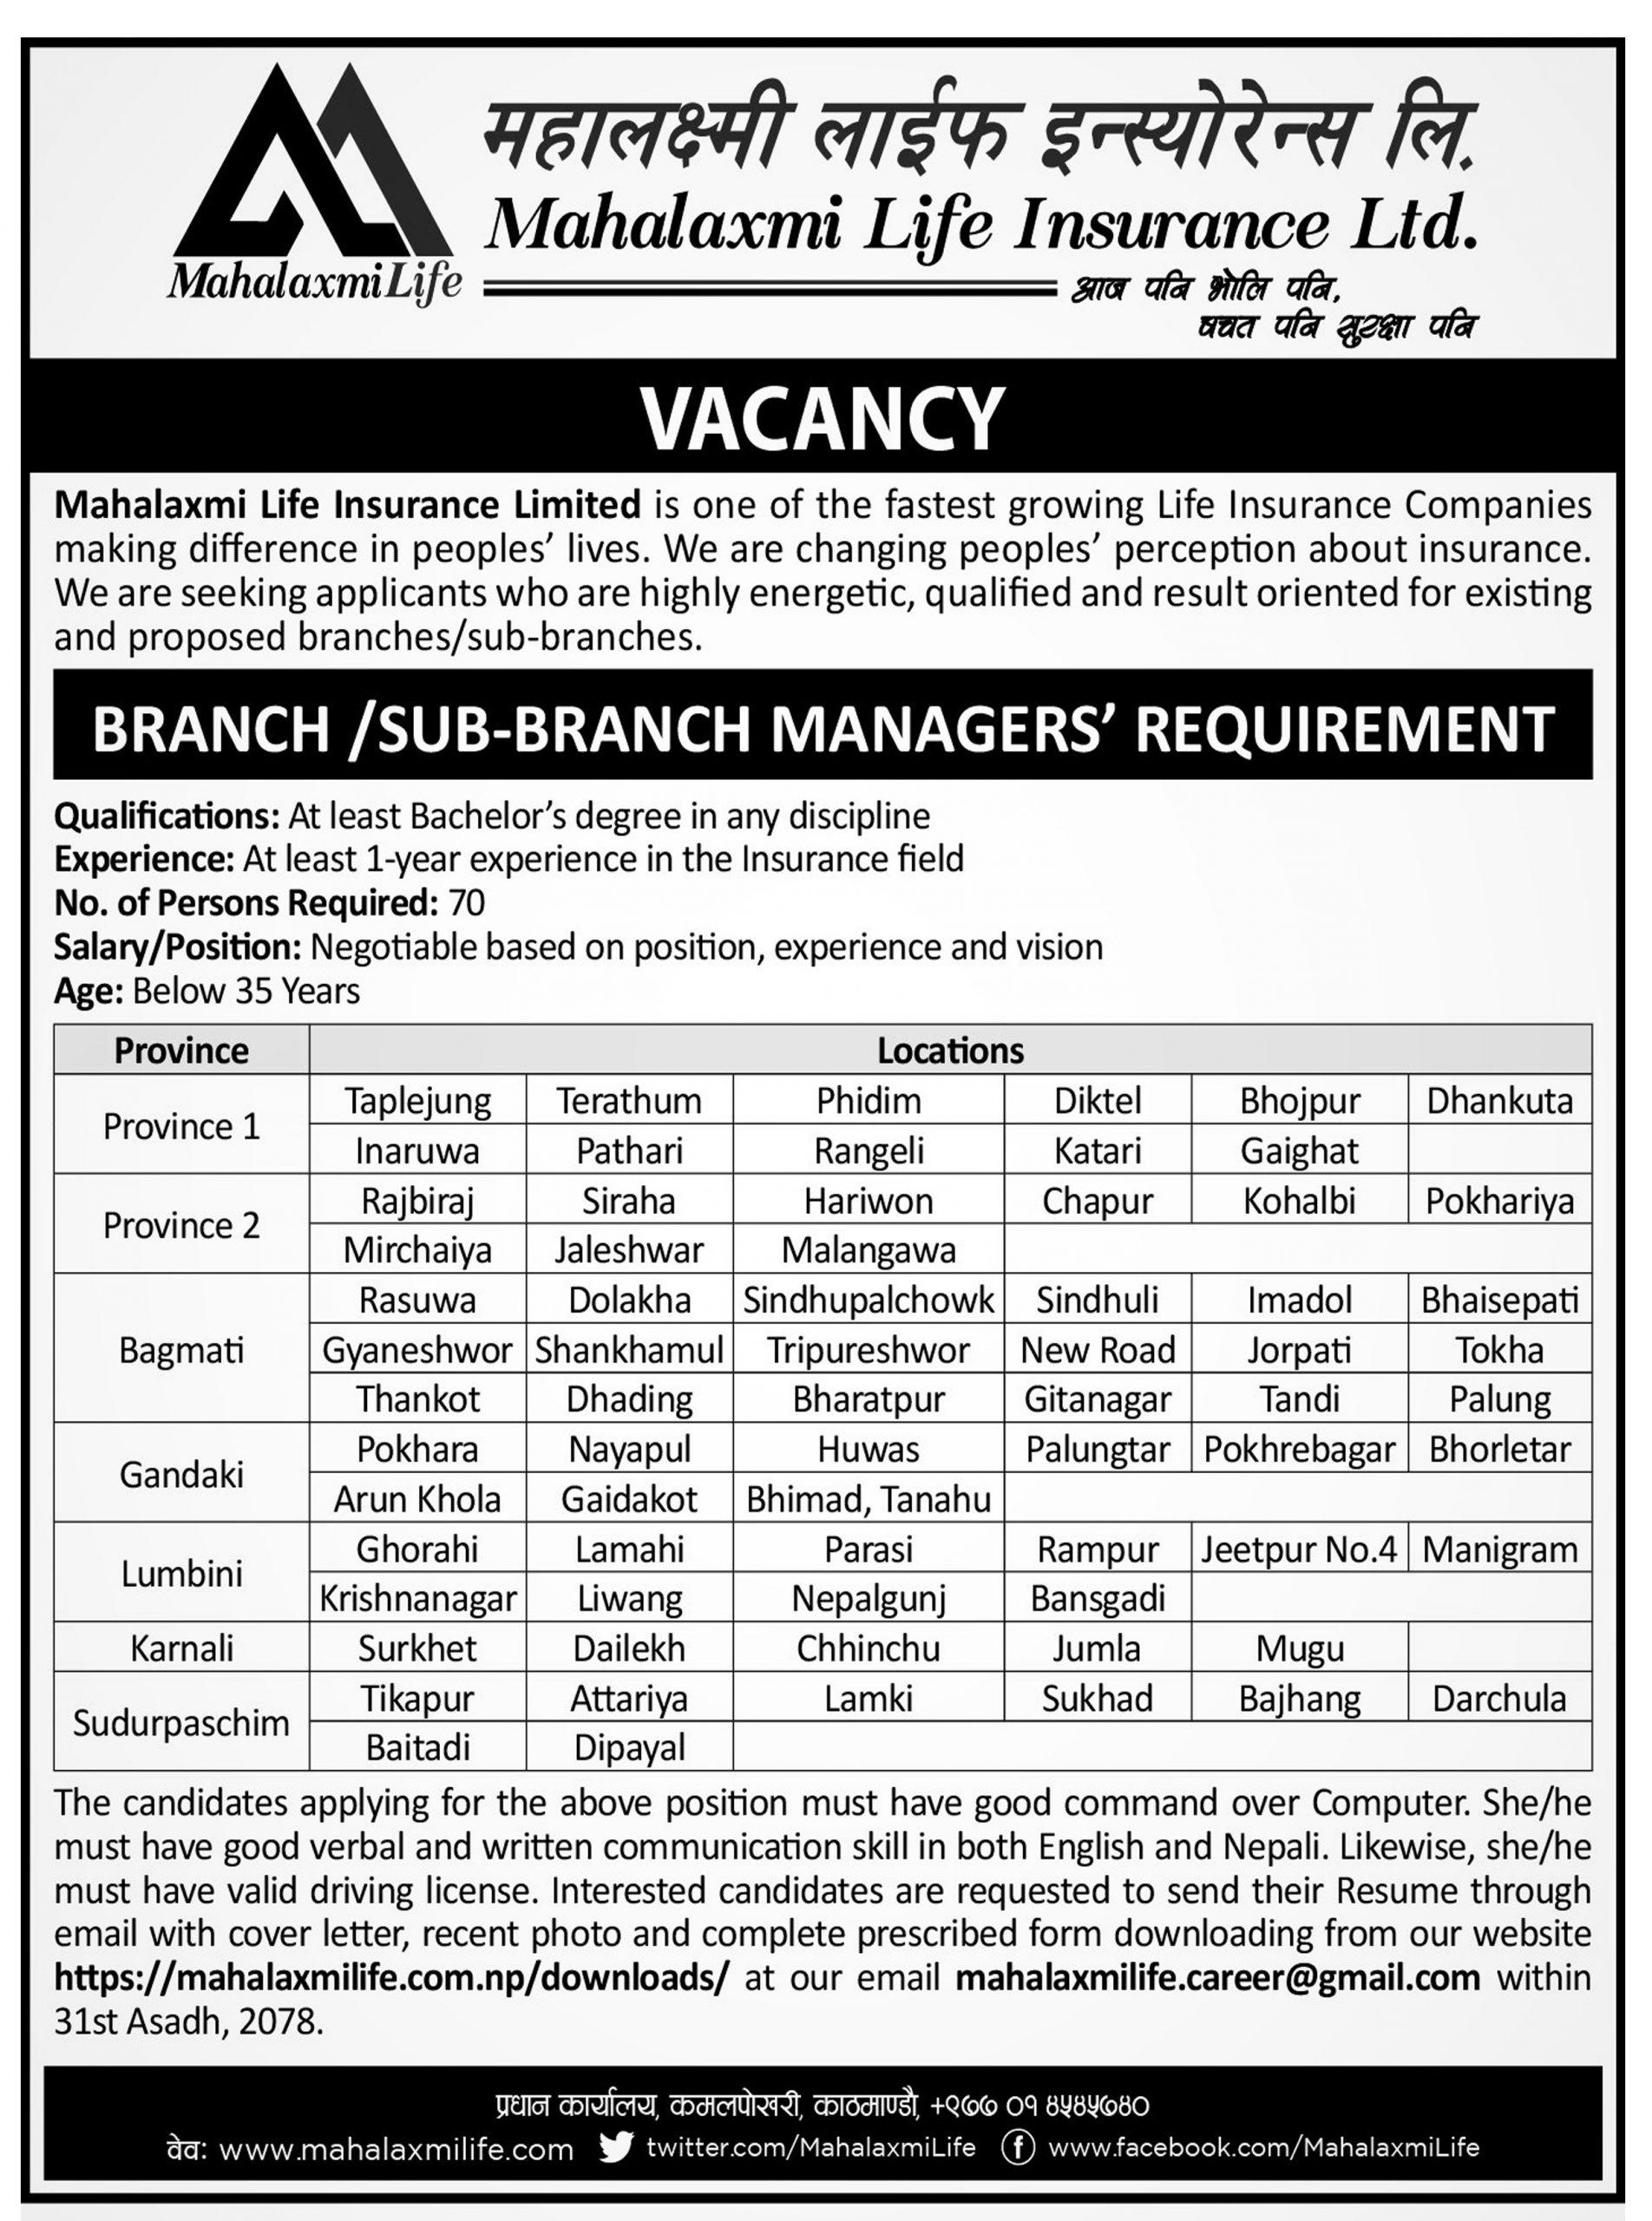 Mahalaxmi Life Insurance Ltd. announces vacancy announcement for various positionss